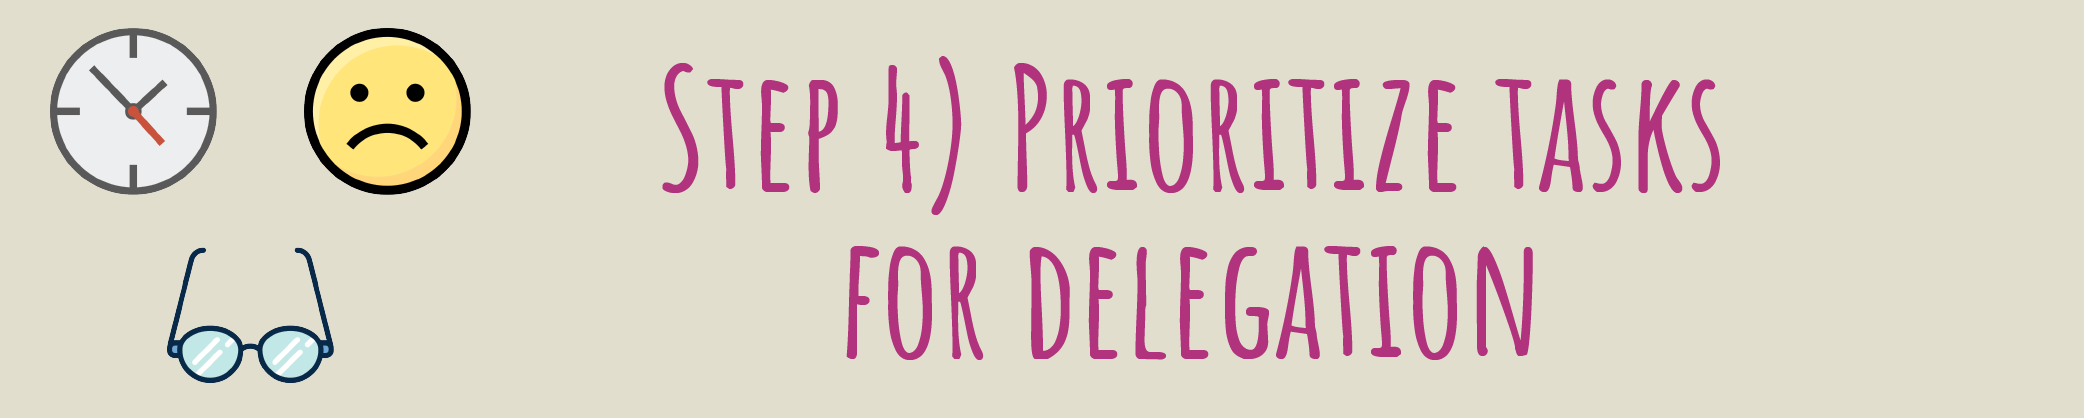 Step-4-Prioritize-Tasks.png